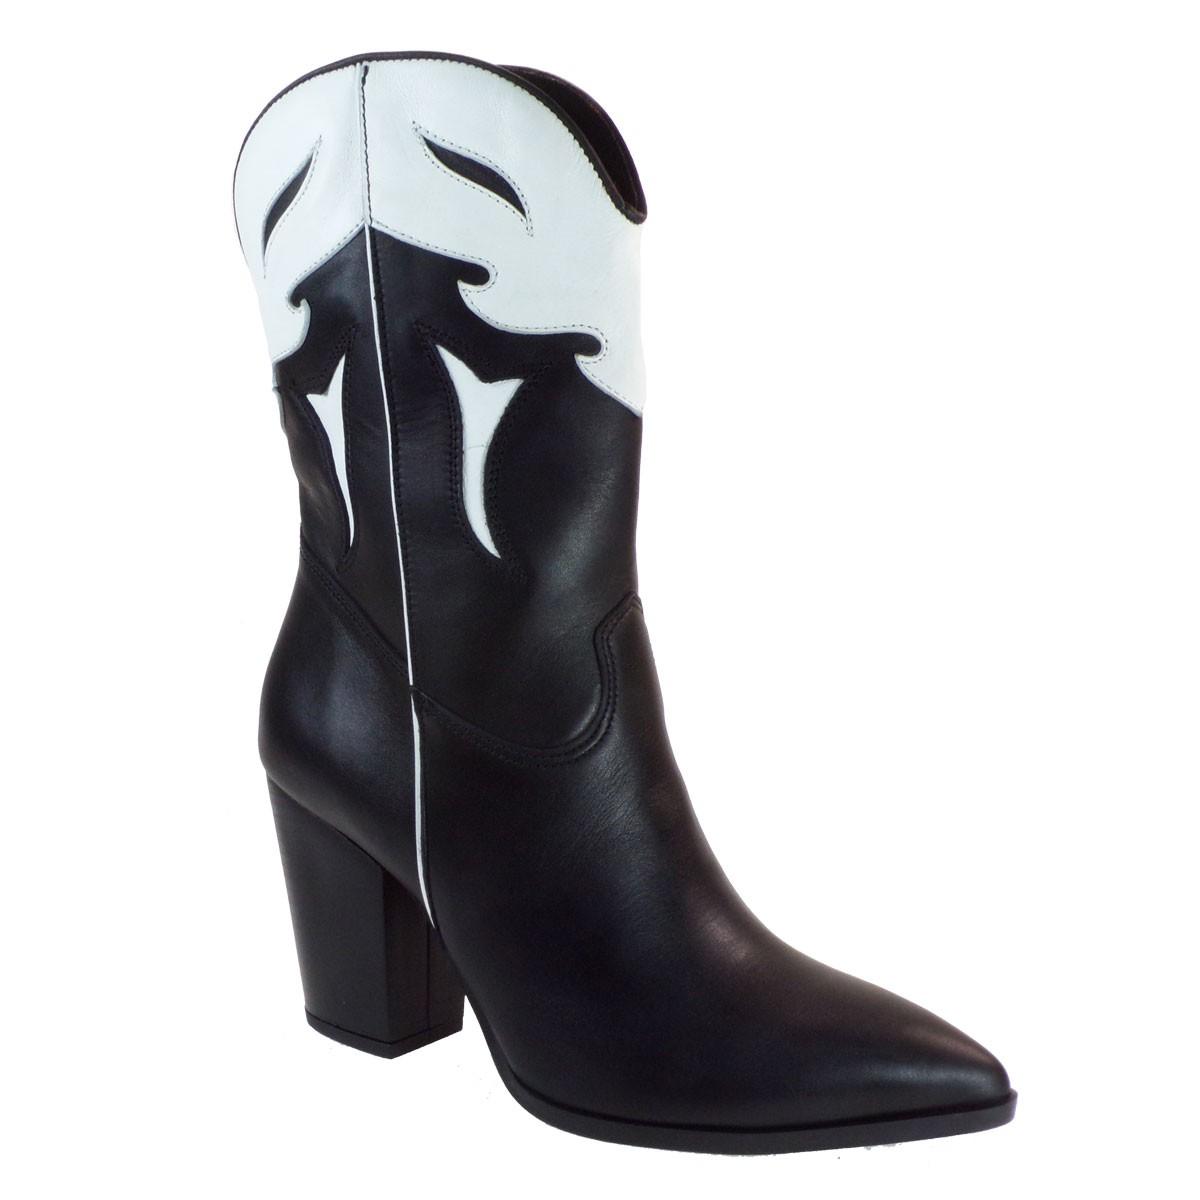 Fardoulis Shoes Γυναικεία Μπότα COW BOY Κ-351 Μαύρο Δέρμα